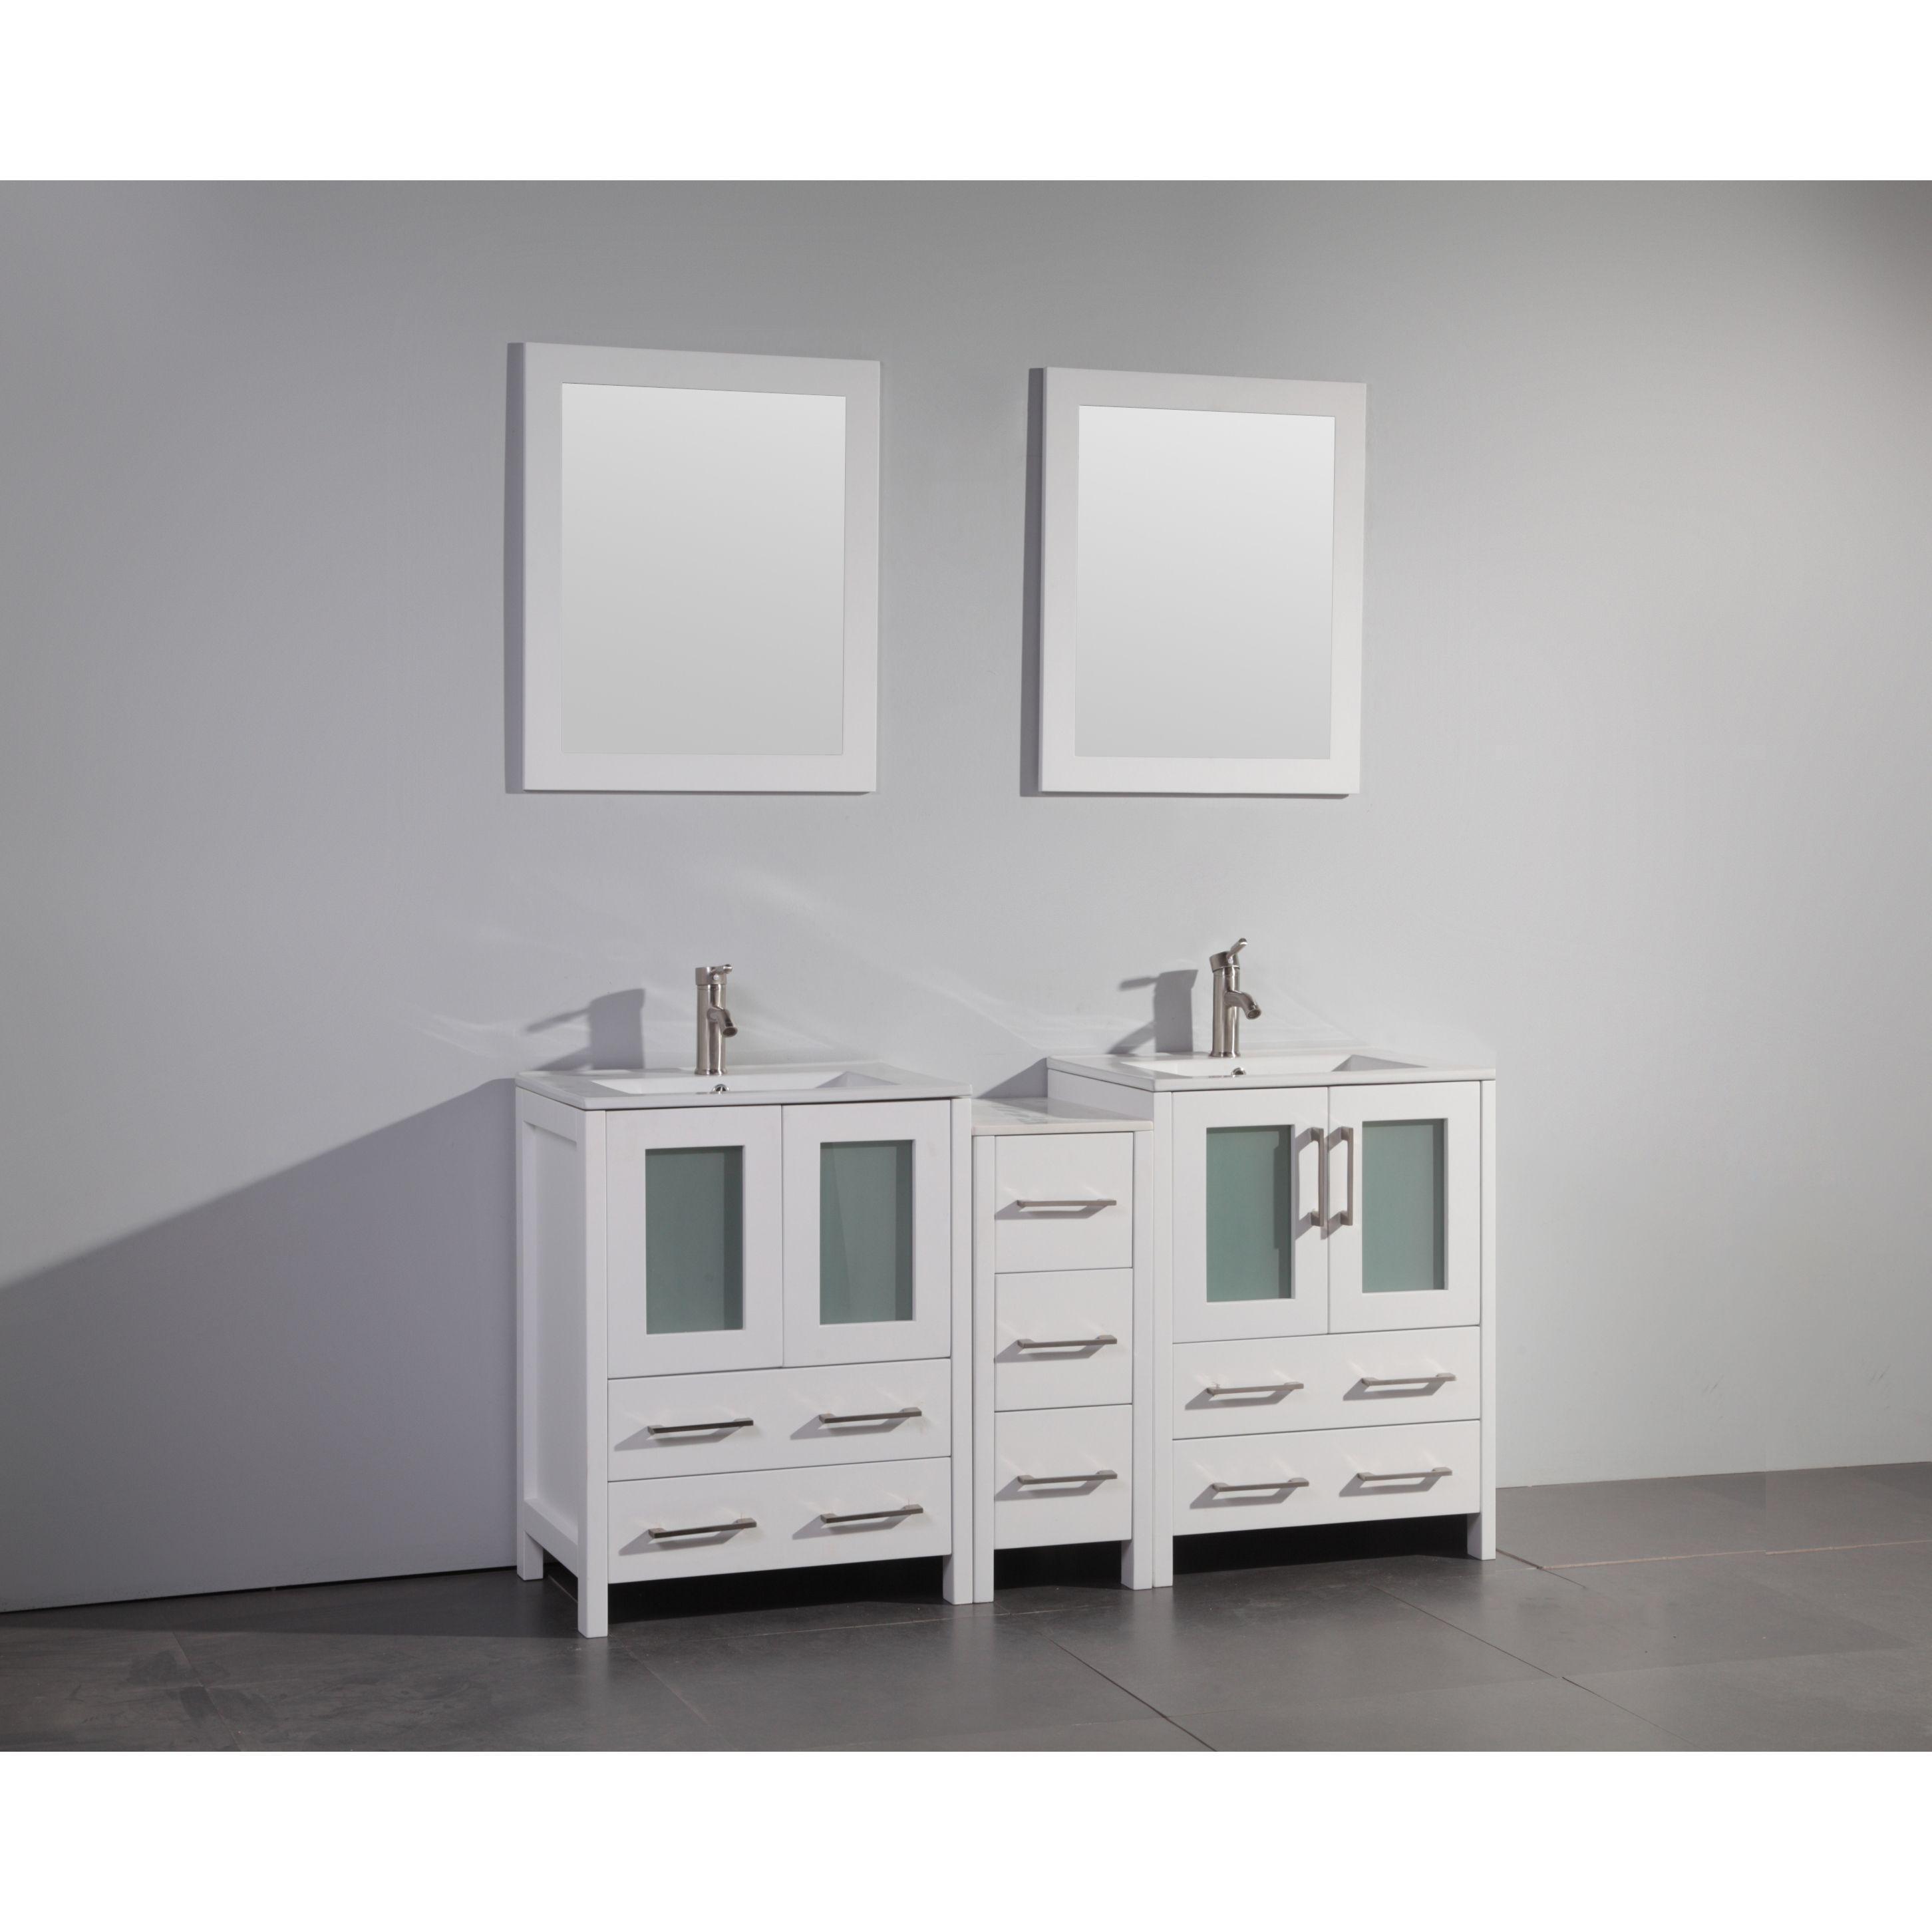 Vanity Art White/Grey Oak/Ceramic 60-inch Double Sink Bathroom Vanity Set (White), Size Double Vanities